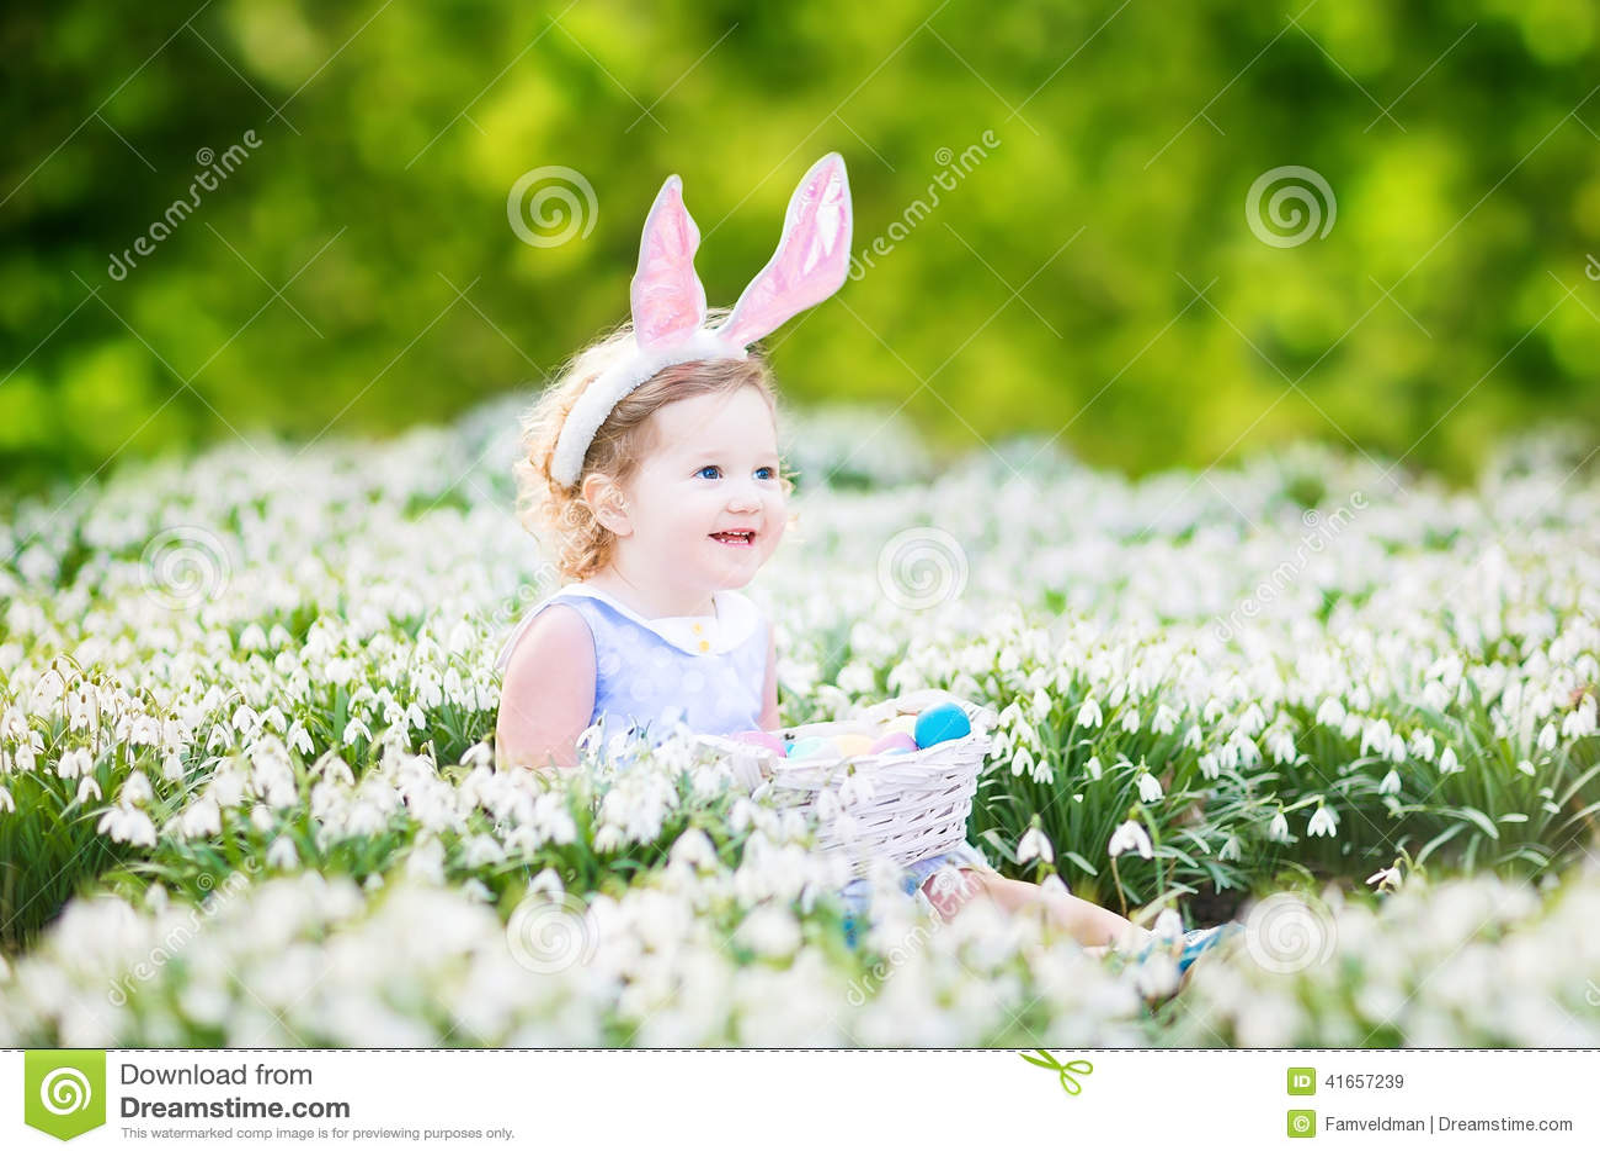 Фото девушка яйца 14 фотография